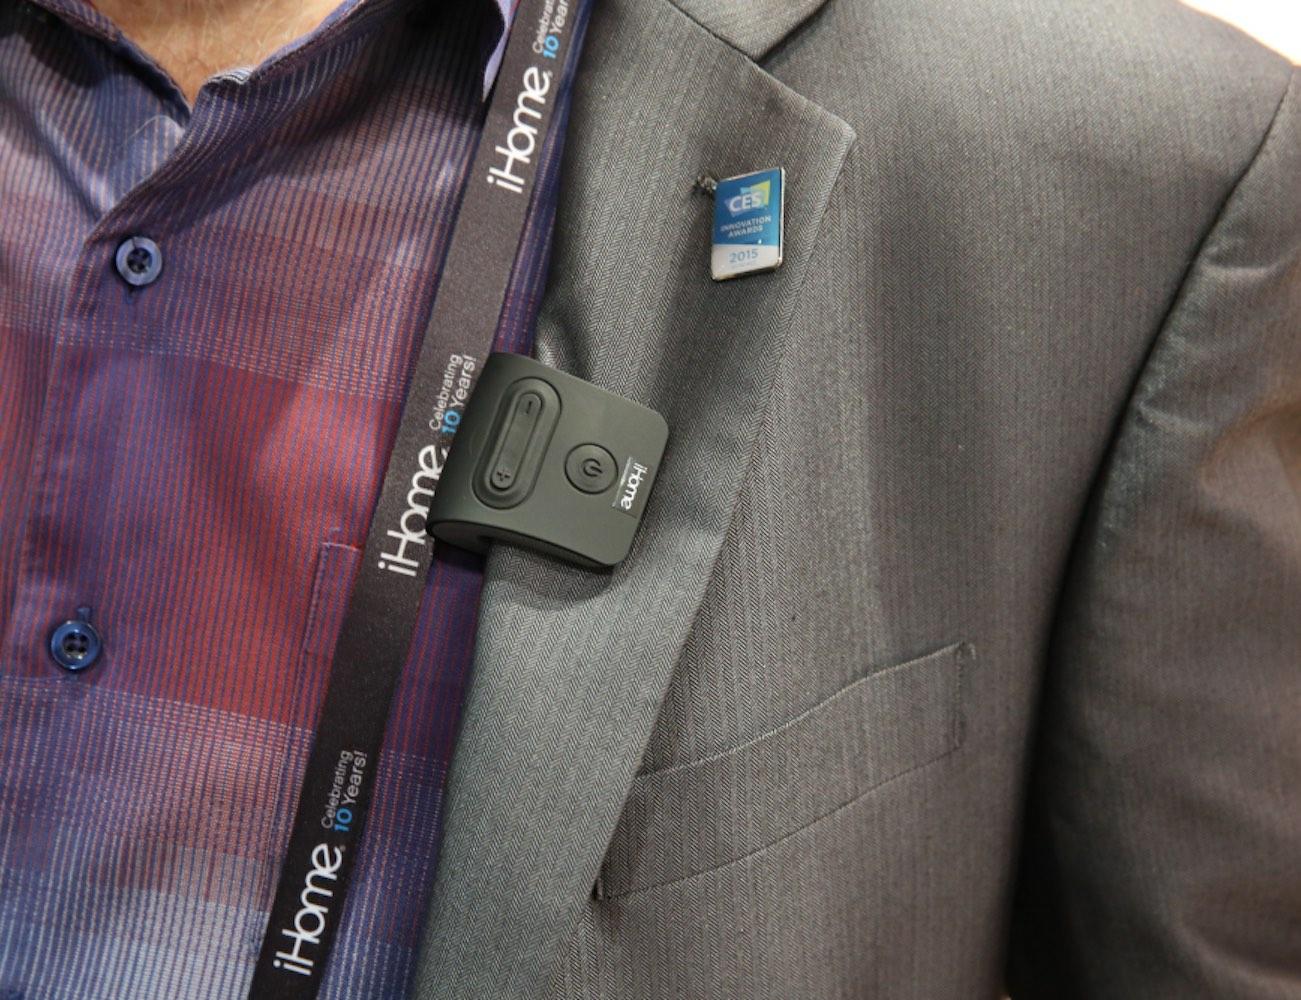 iHome Wearable Bluetooth Mini Speaker